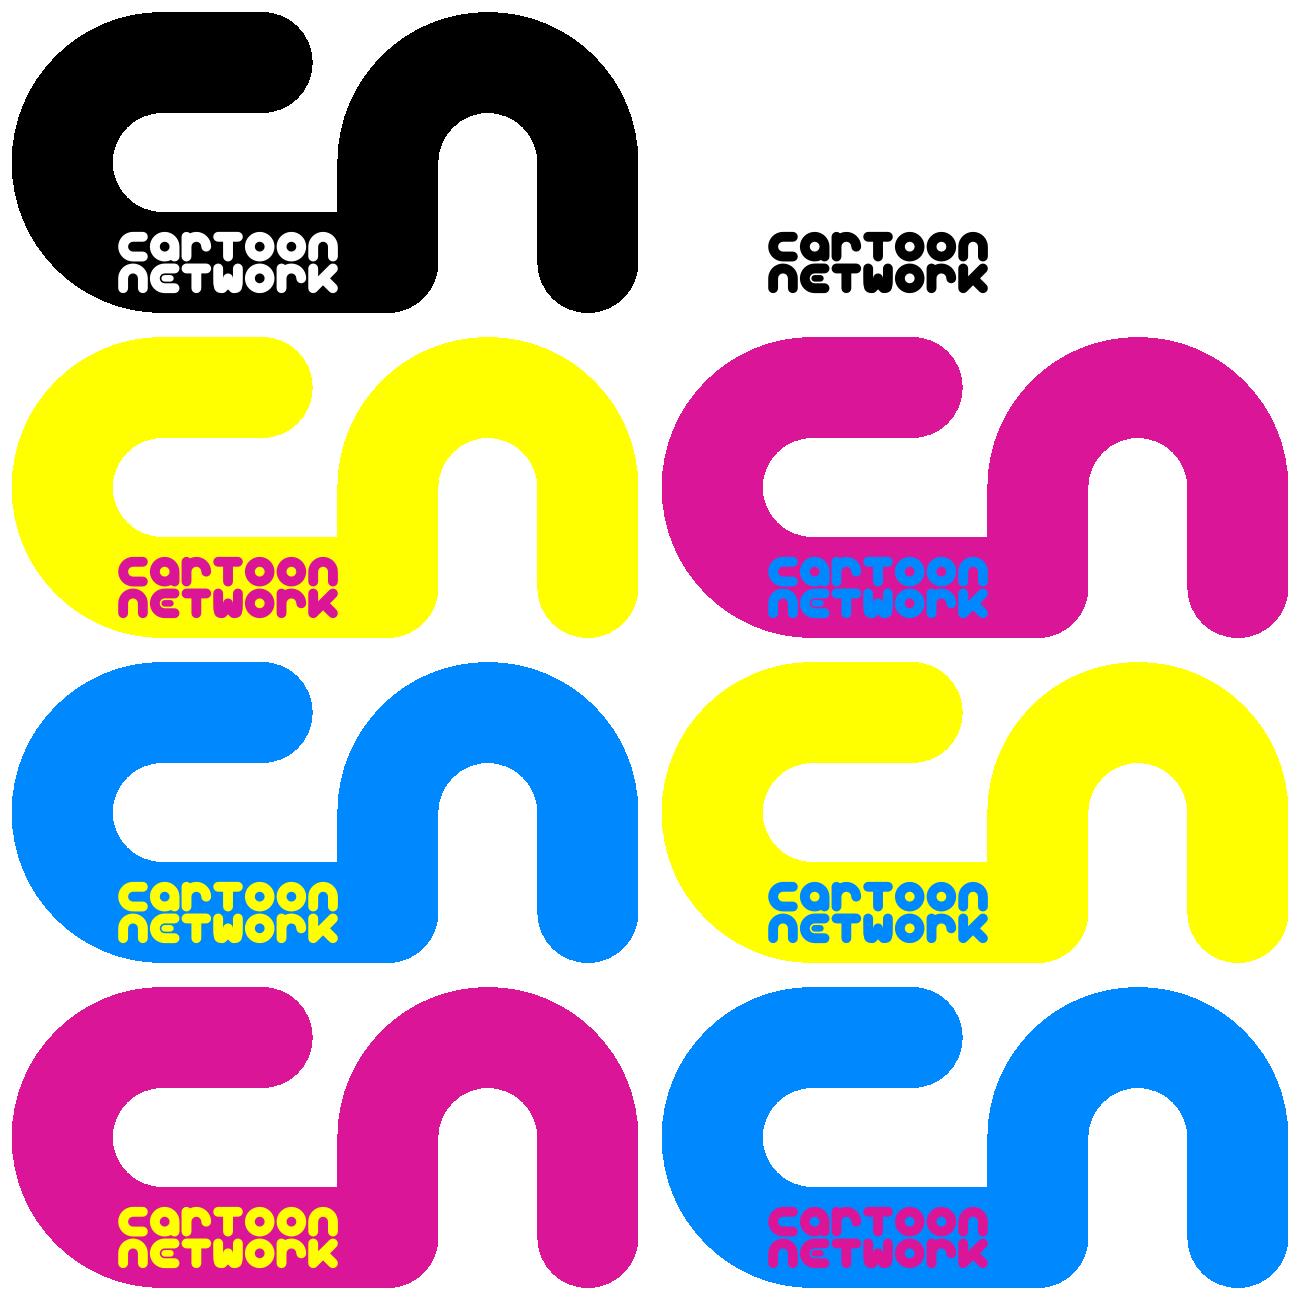 how i should rebrand the cartoon network logo by decatilde on deviantart